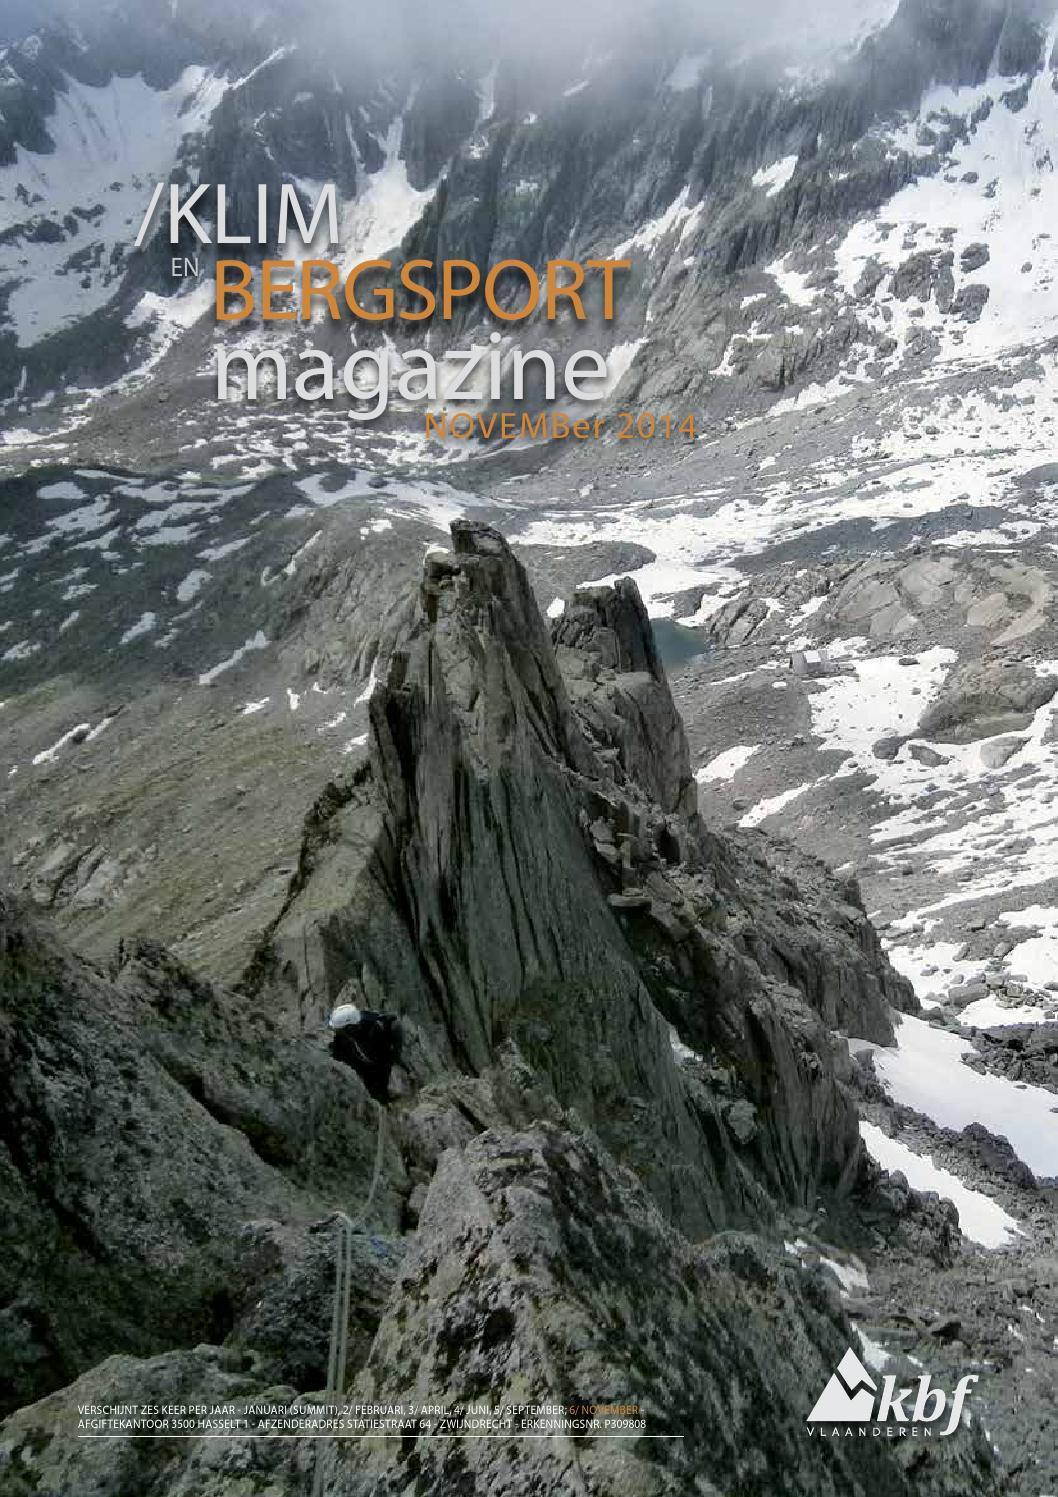 Klim- en bergsportmagazine 2014 5